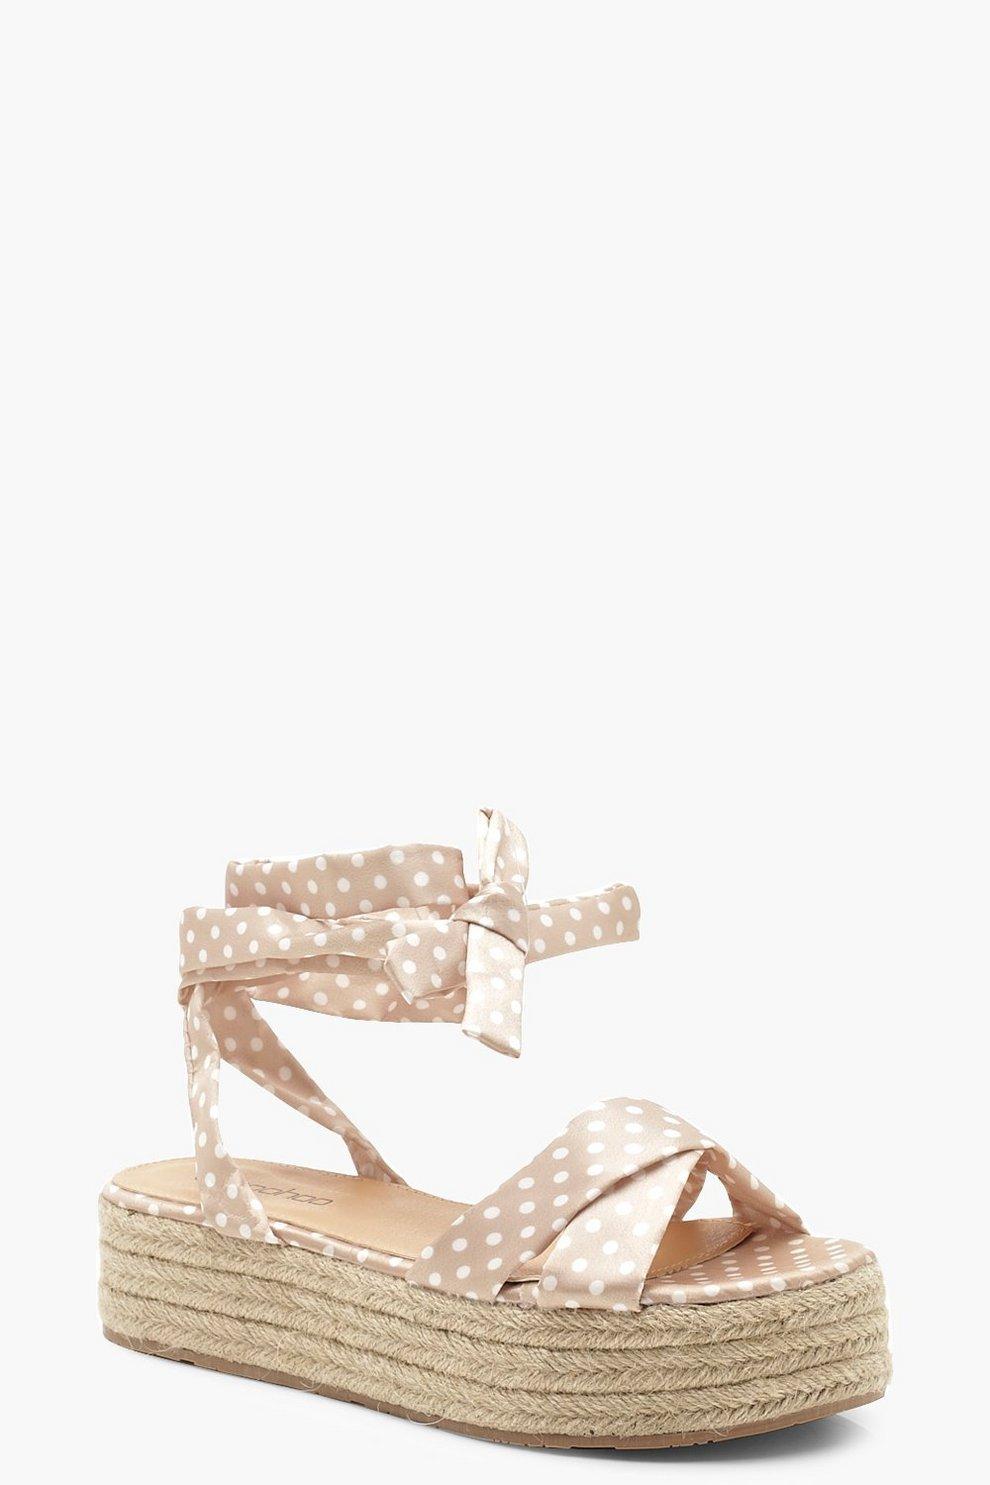 d6fab7b000 Polka Dot Wrap Strap Espadrille Flatform Sandals | Boohoo